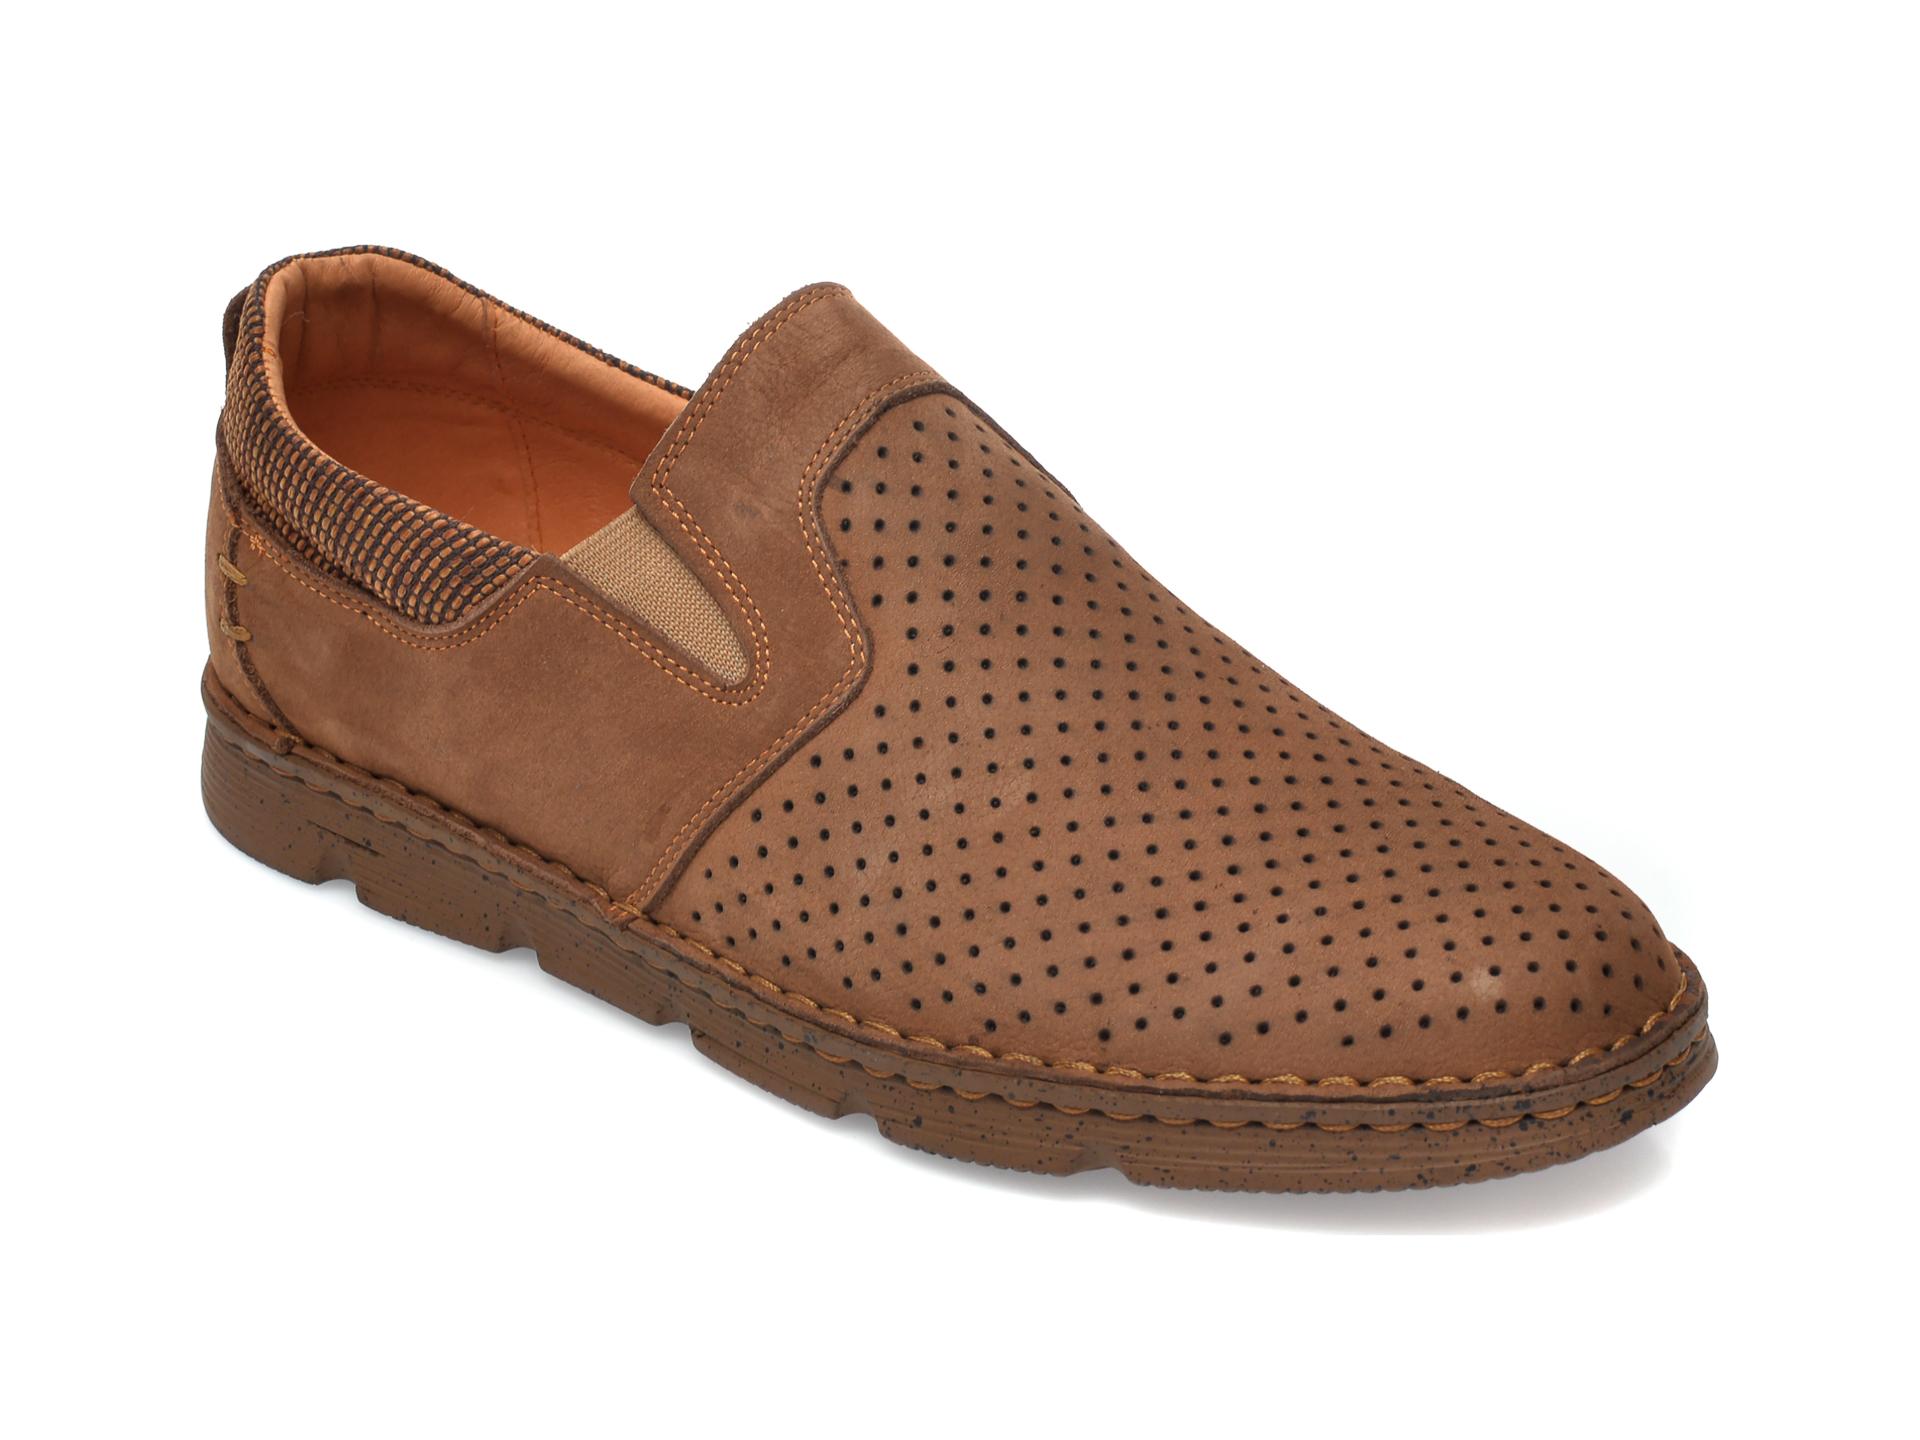 Pantofi OTTER maro, 2832, din nabuc imagine